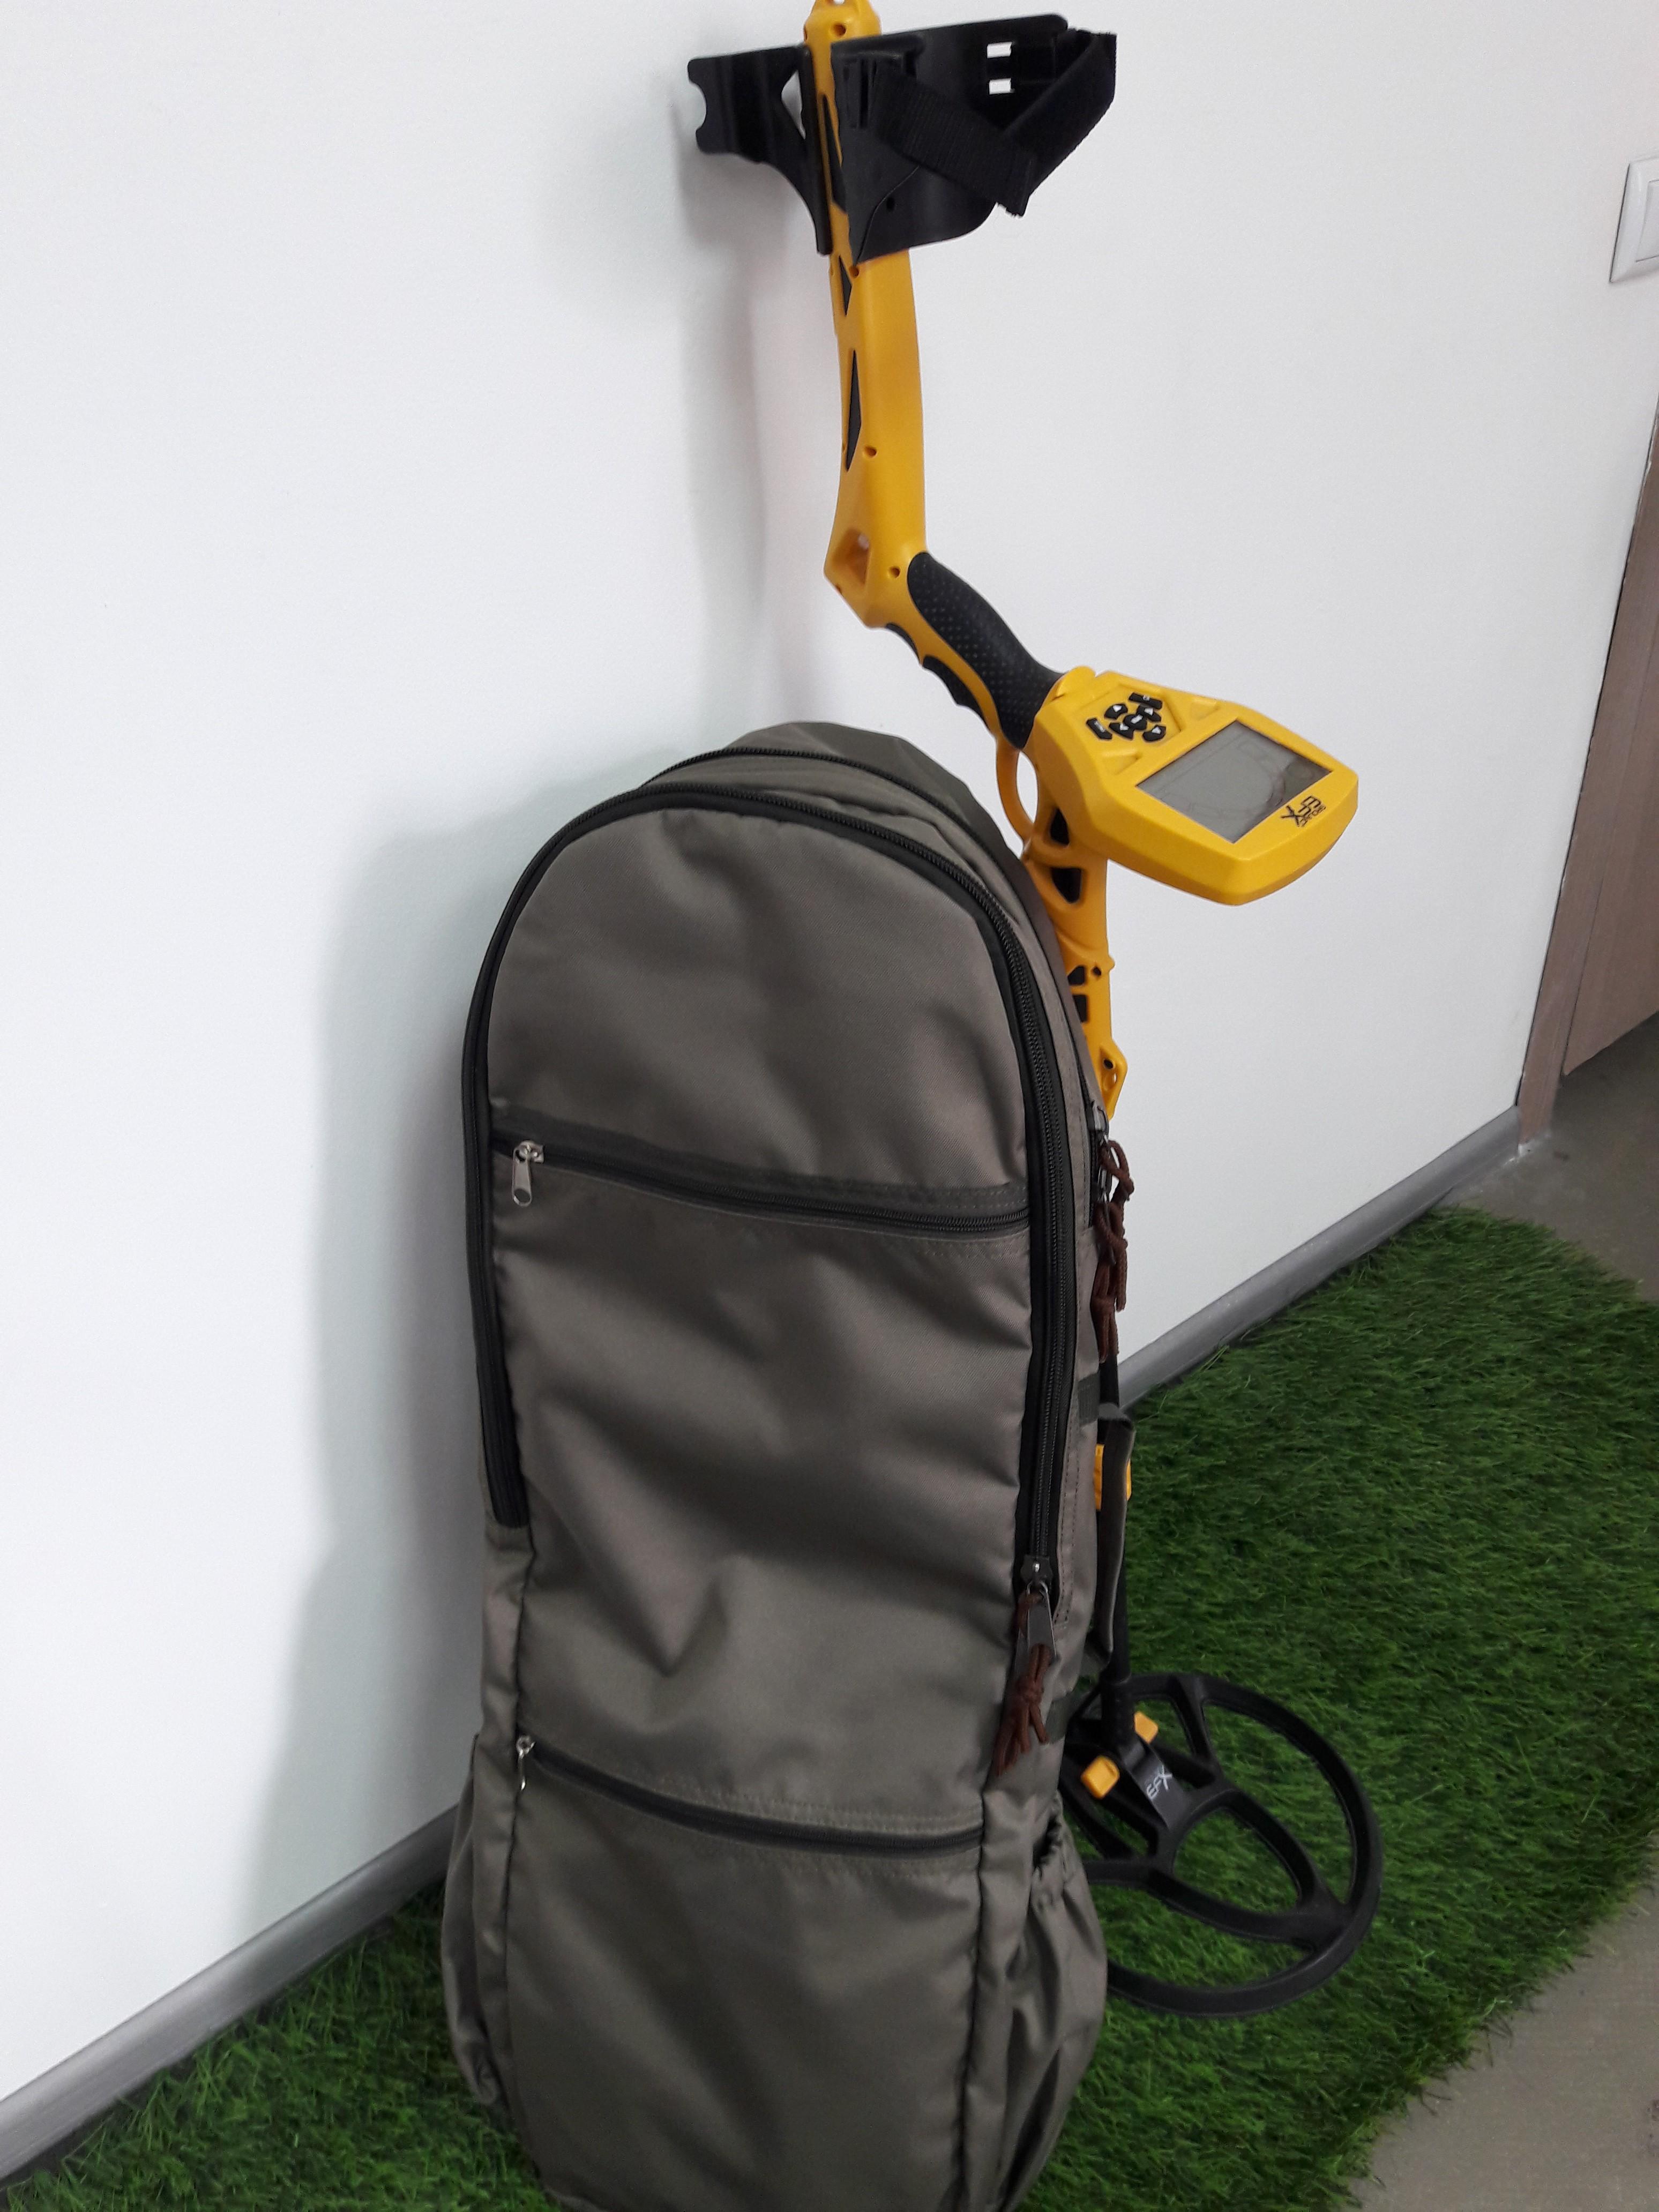 Рюкзаки для копа. рюкзак для металлодетектора. рюкзак для ме.